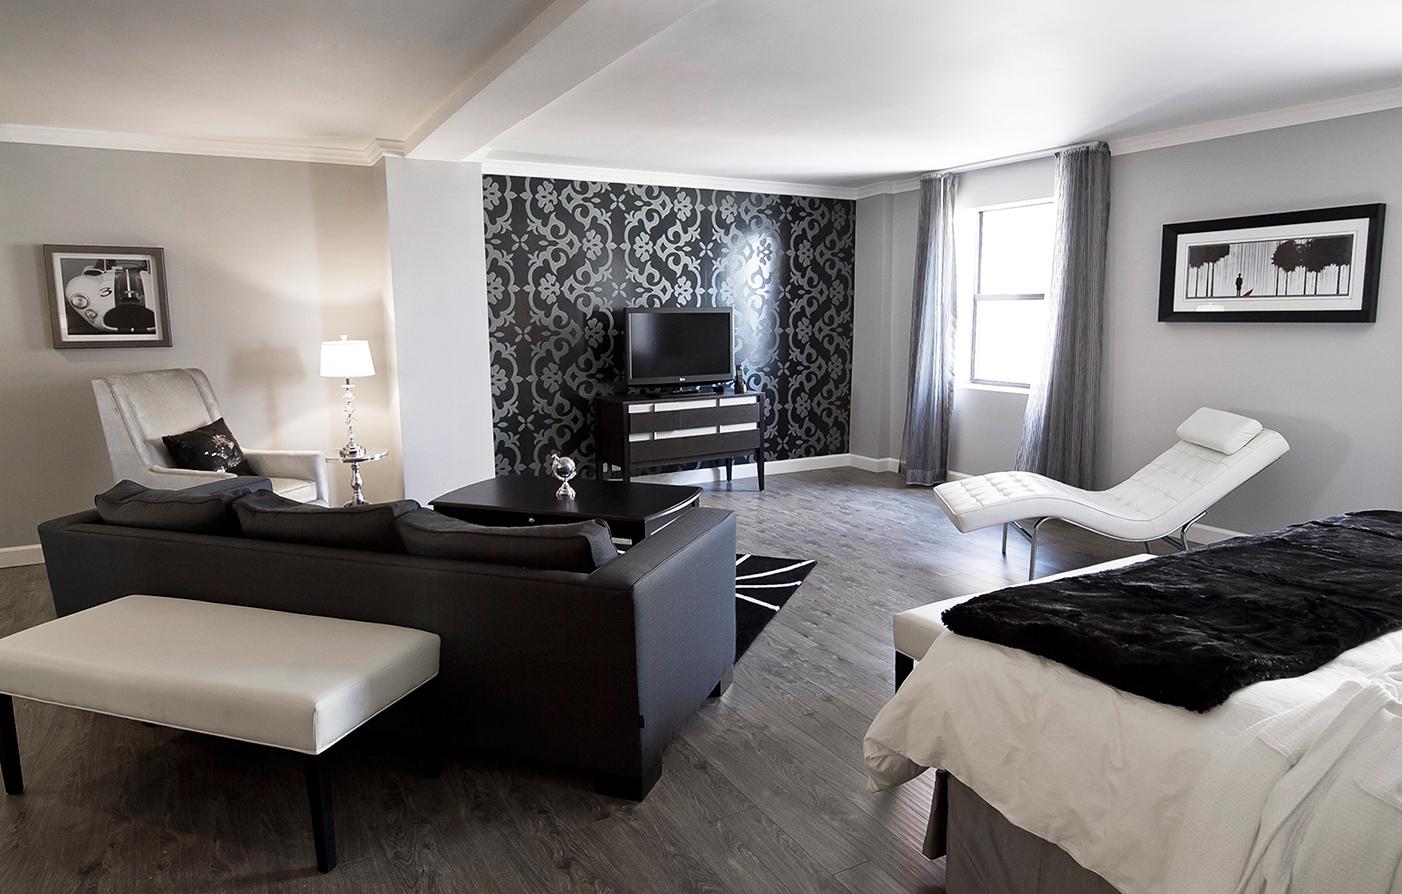 Customer reviews hotel deco xv in omaha